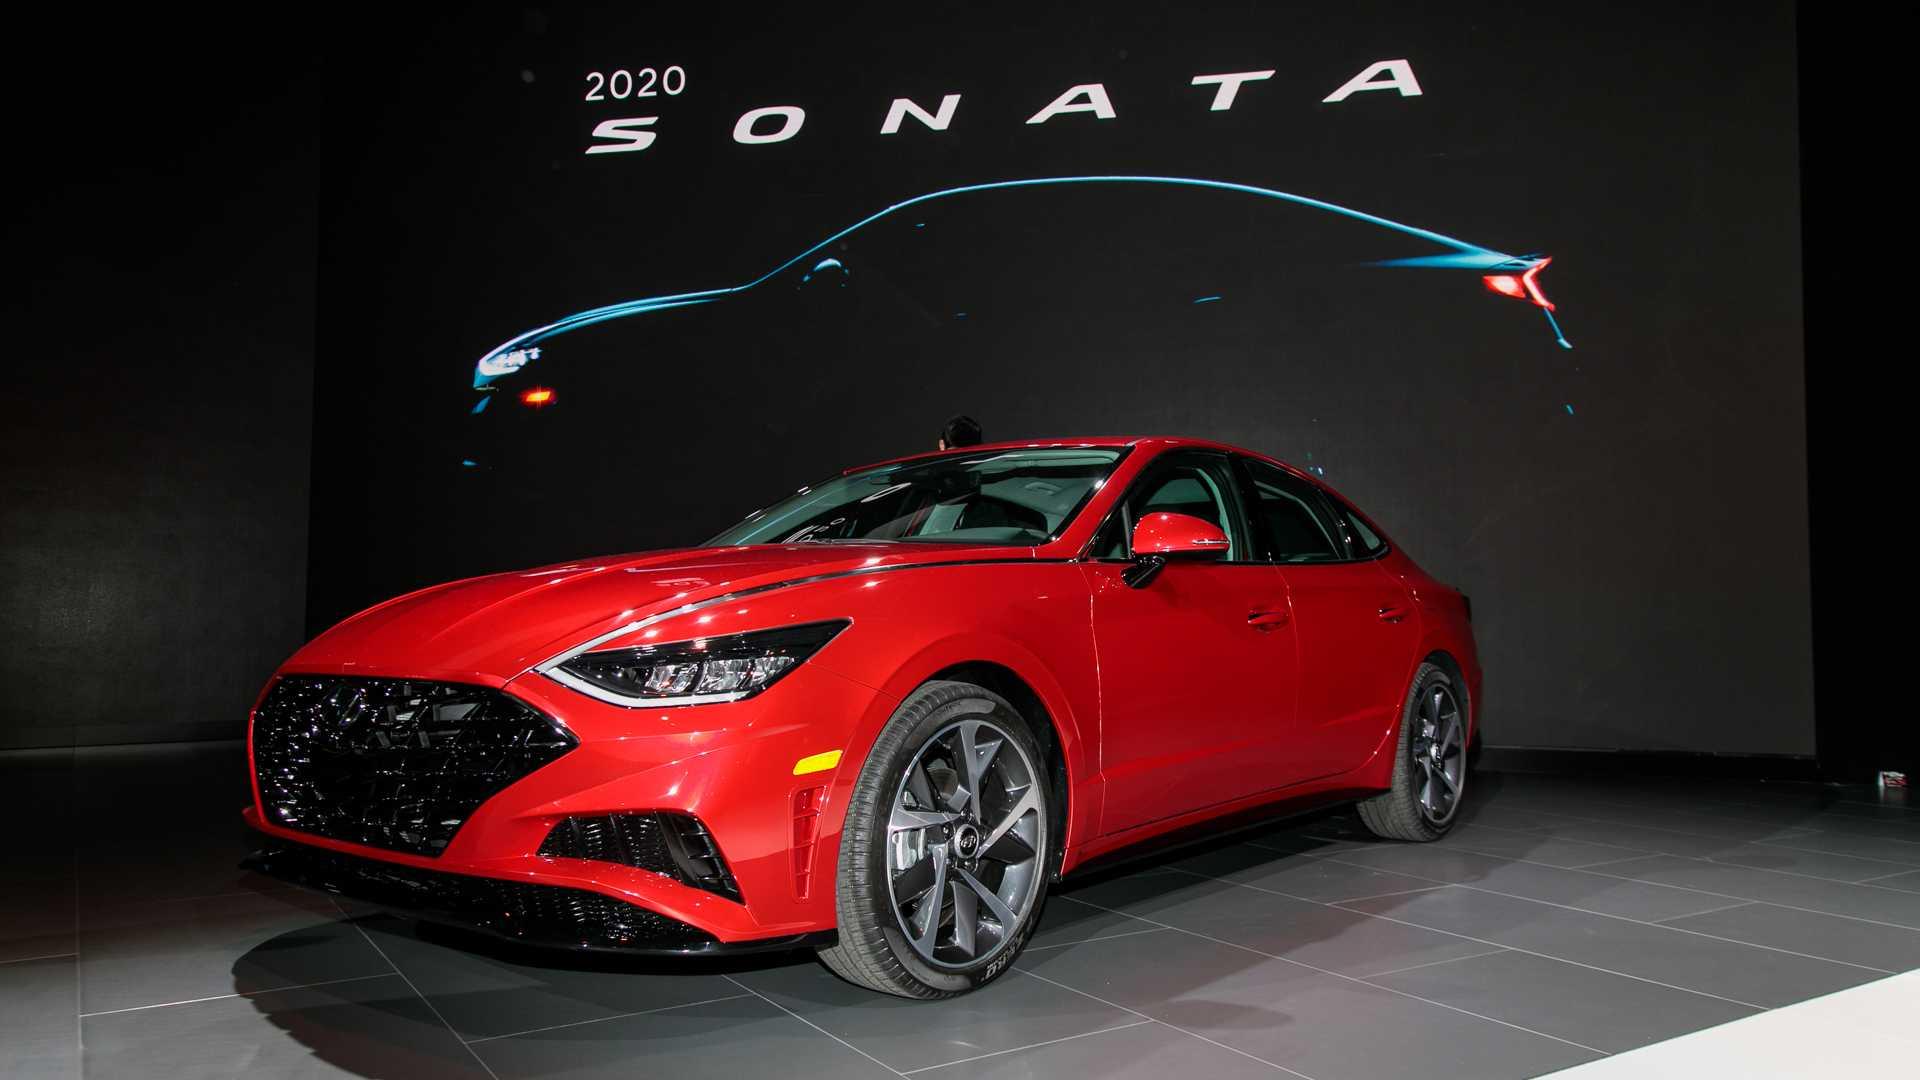 38 All New 2020 Hyundai Sonata N Line Images by 2020 Hyundai Sonata N Line